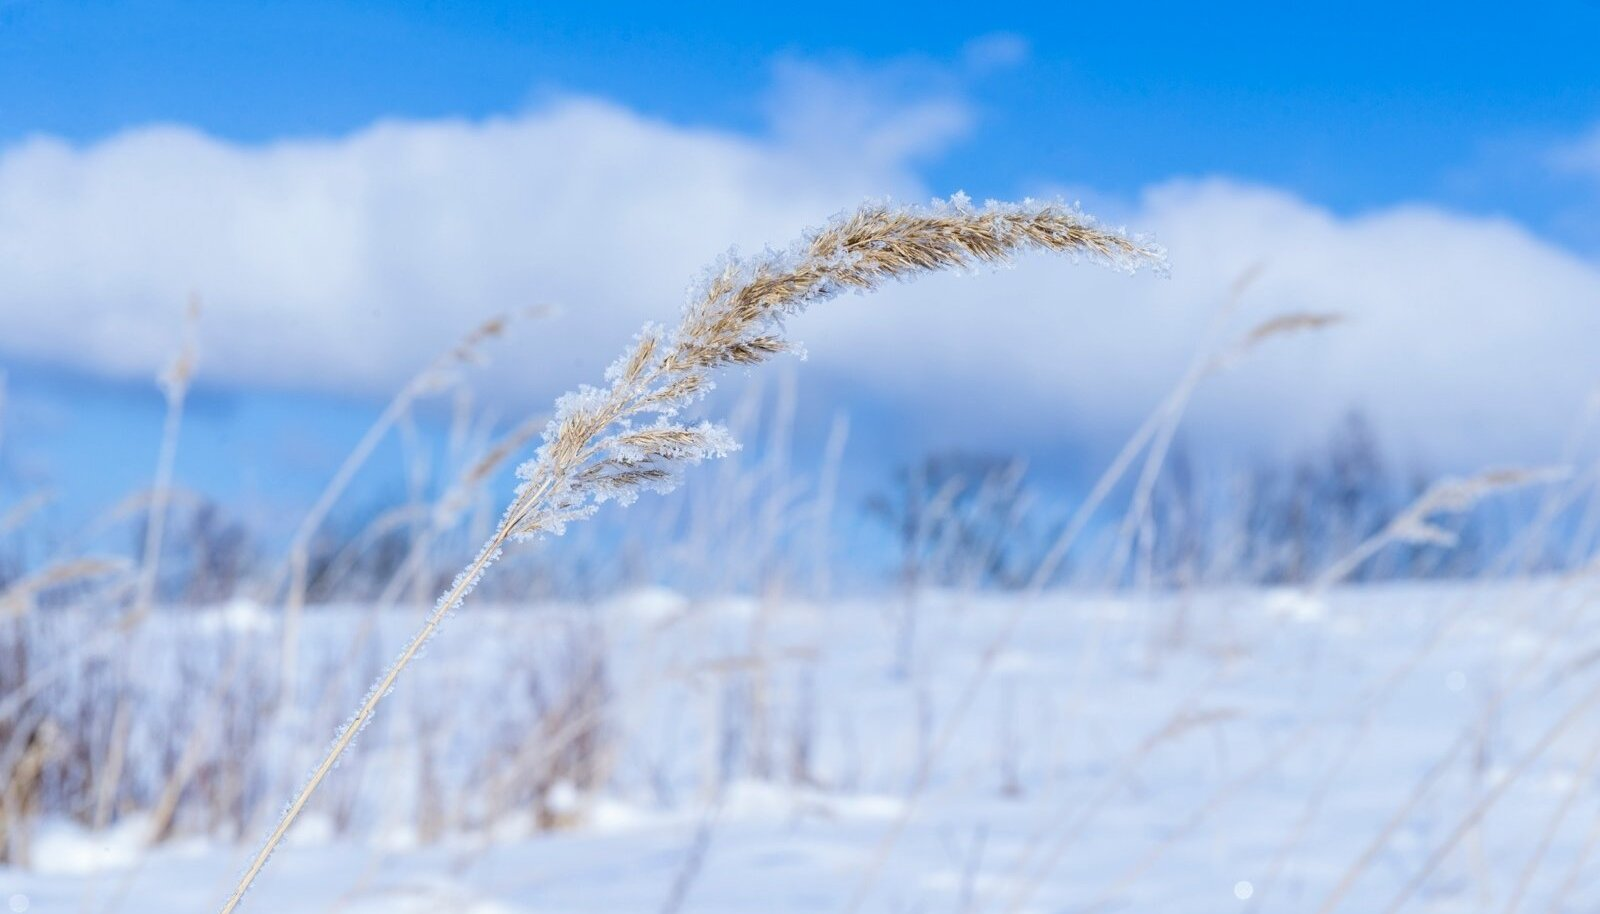 Imeilus talveilm